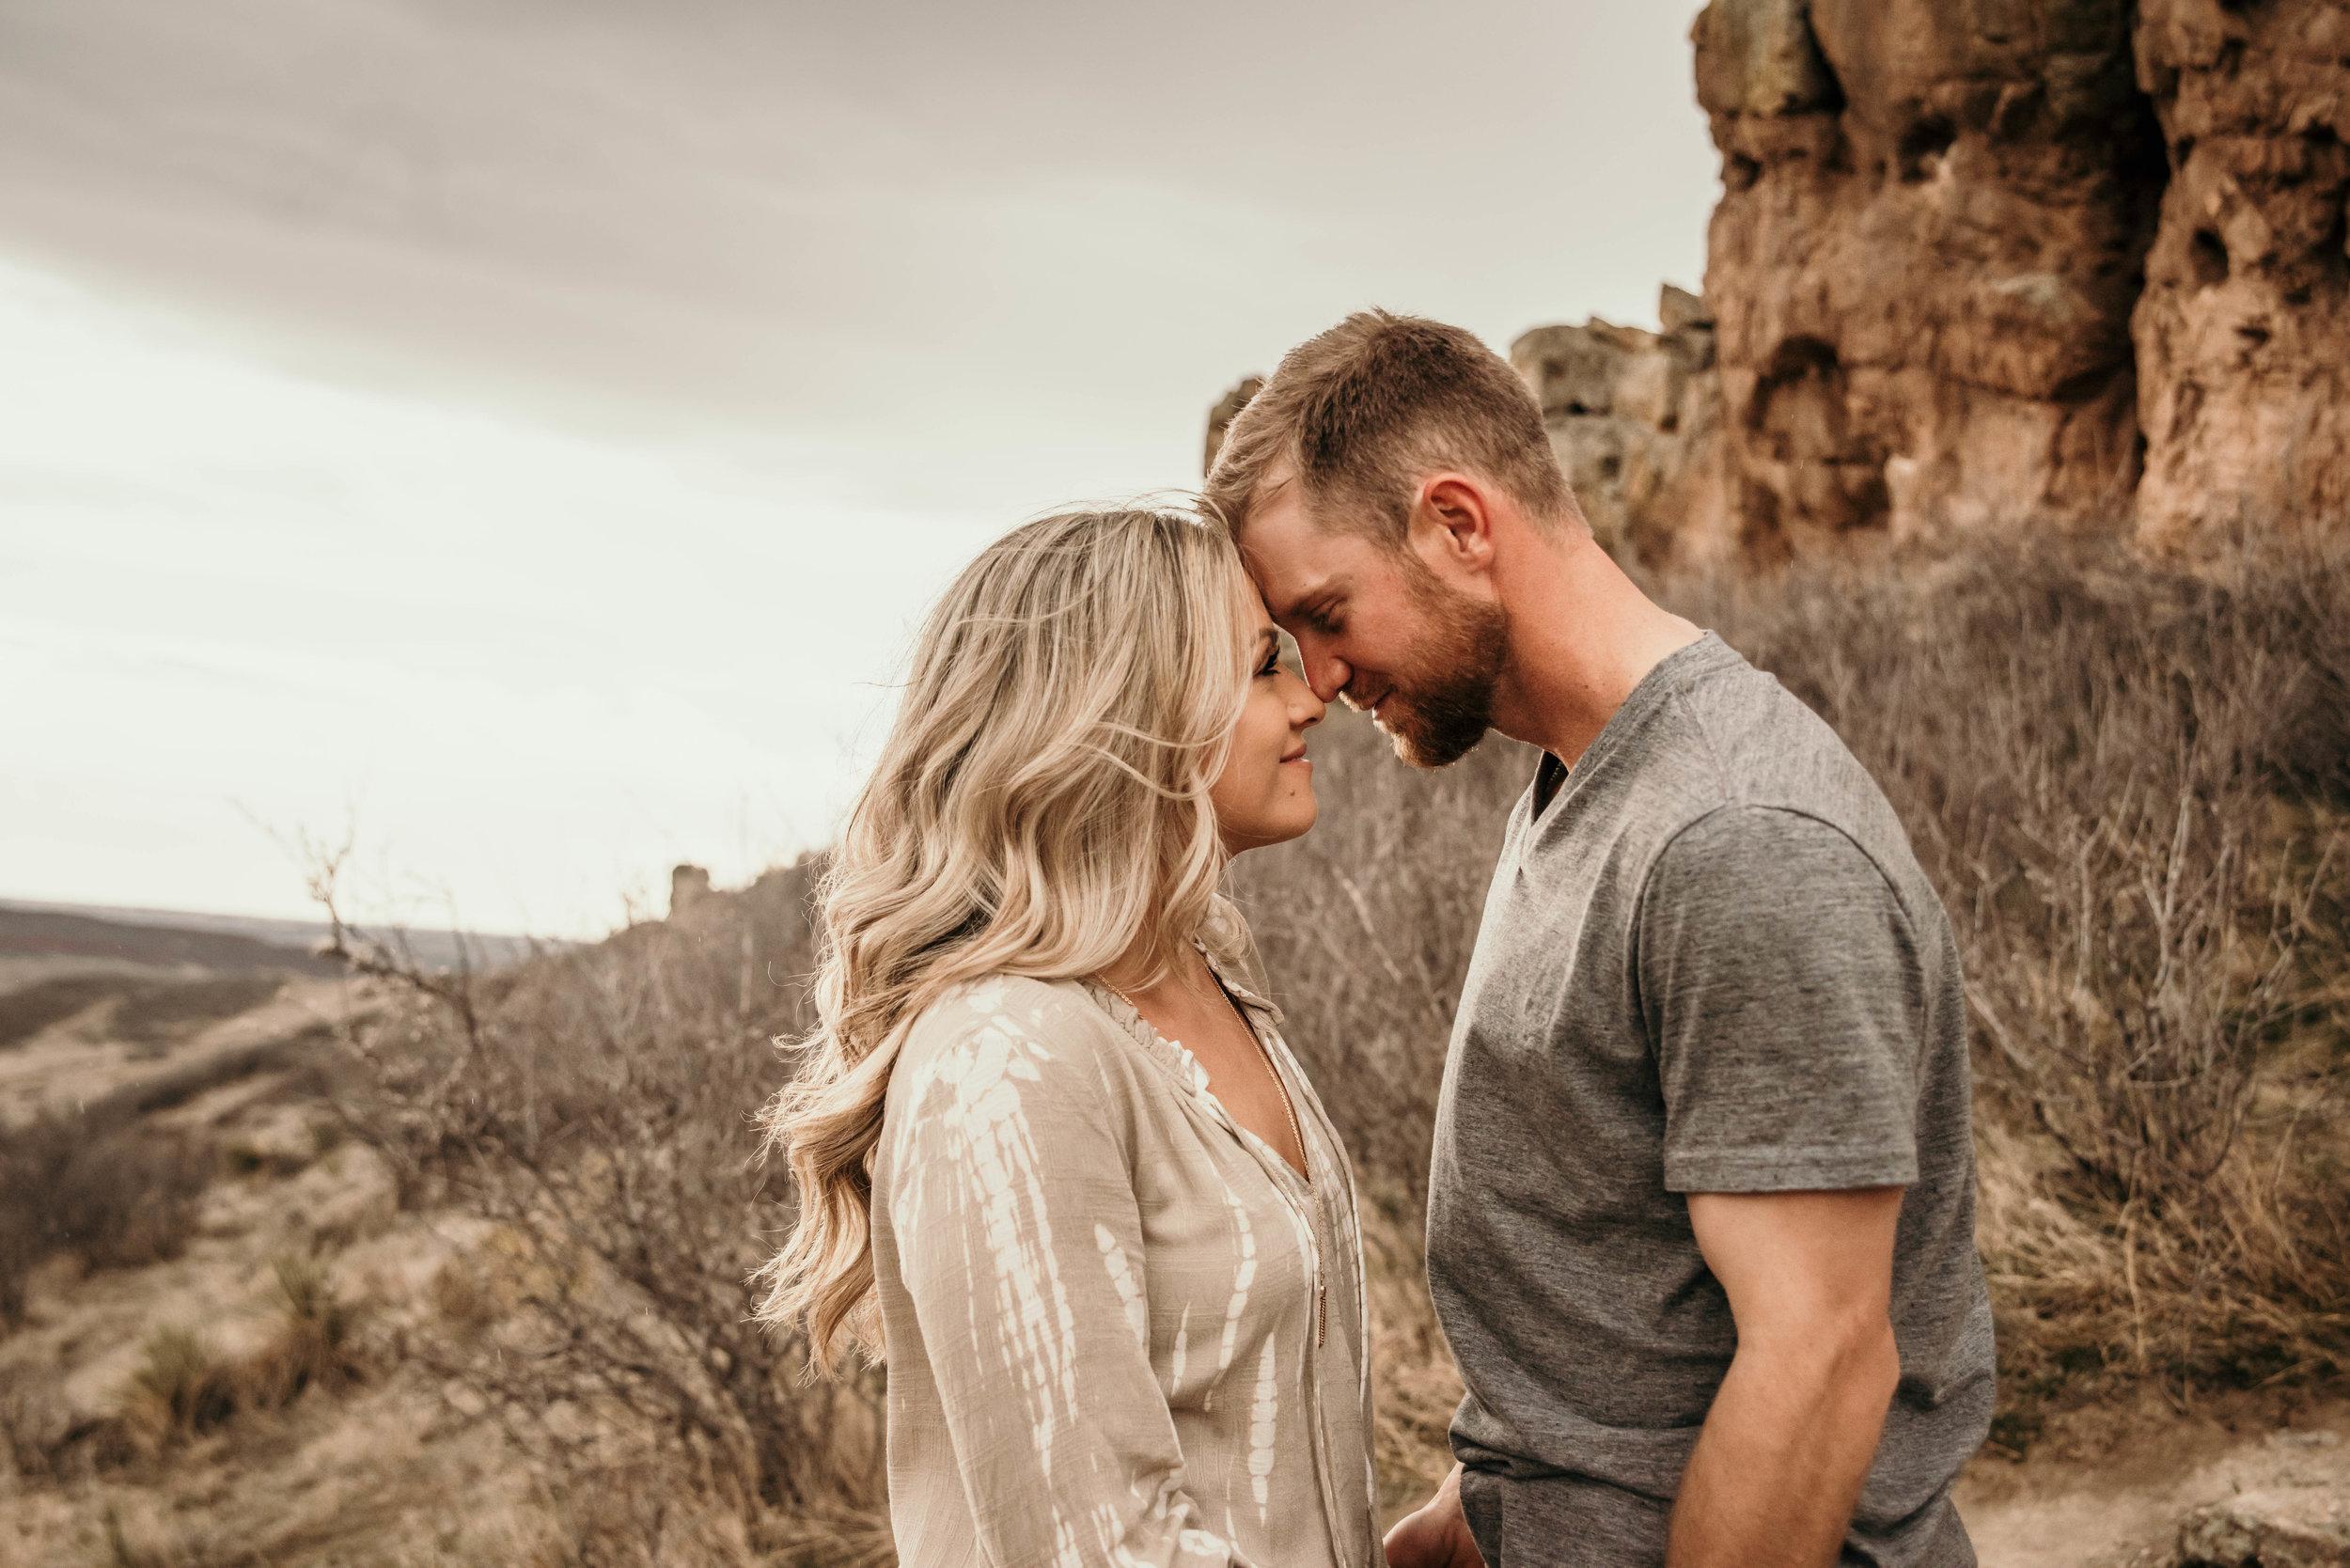 Colorado Destination Wedding Photographer | Miss. Miller's Photography | Colorado Engagement Photographer